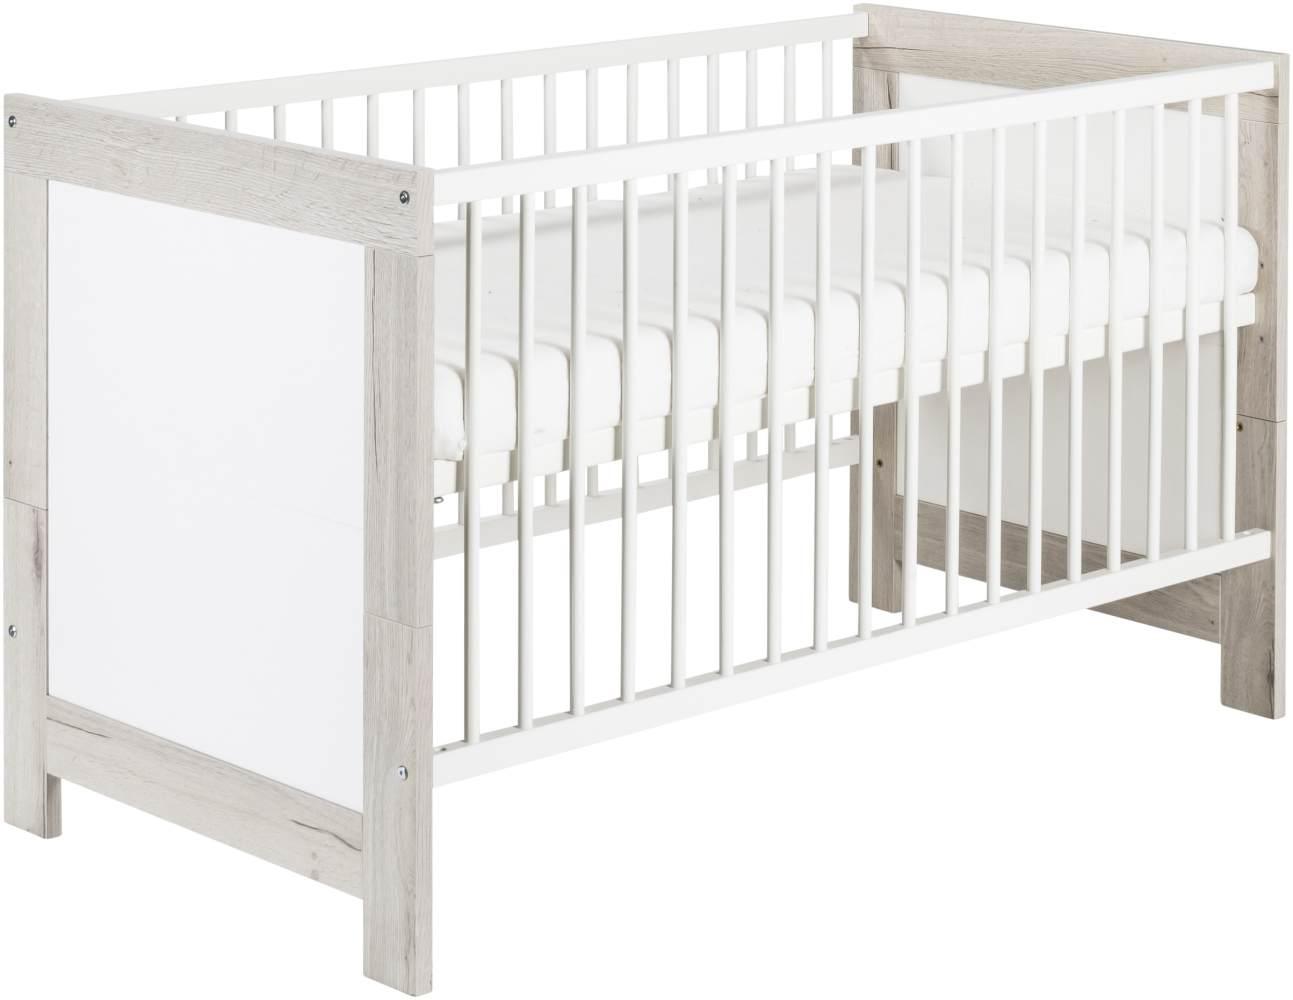 Schardt 'Nordic Haliax' Kombi-Kinderbett weiß Bild 1